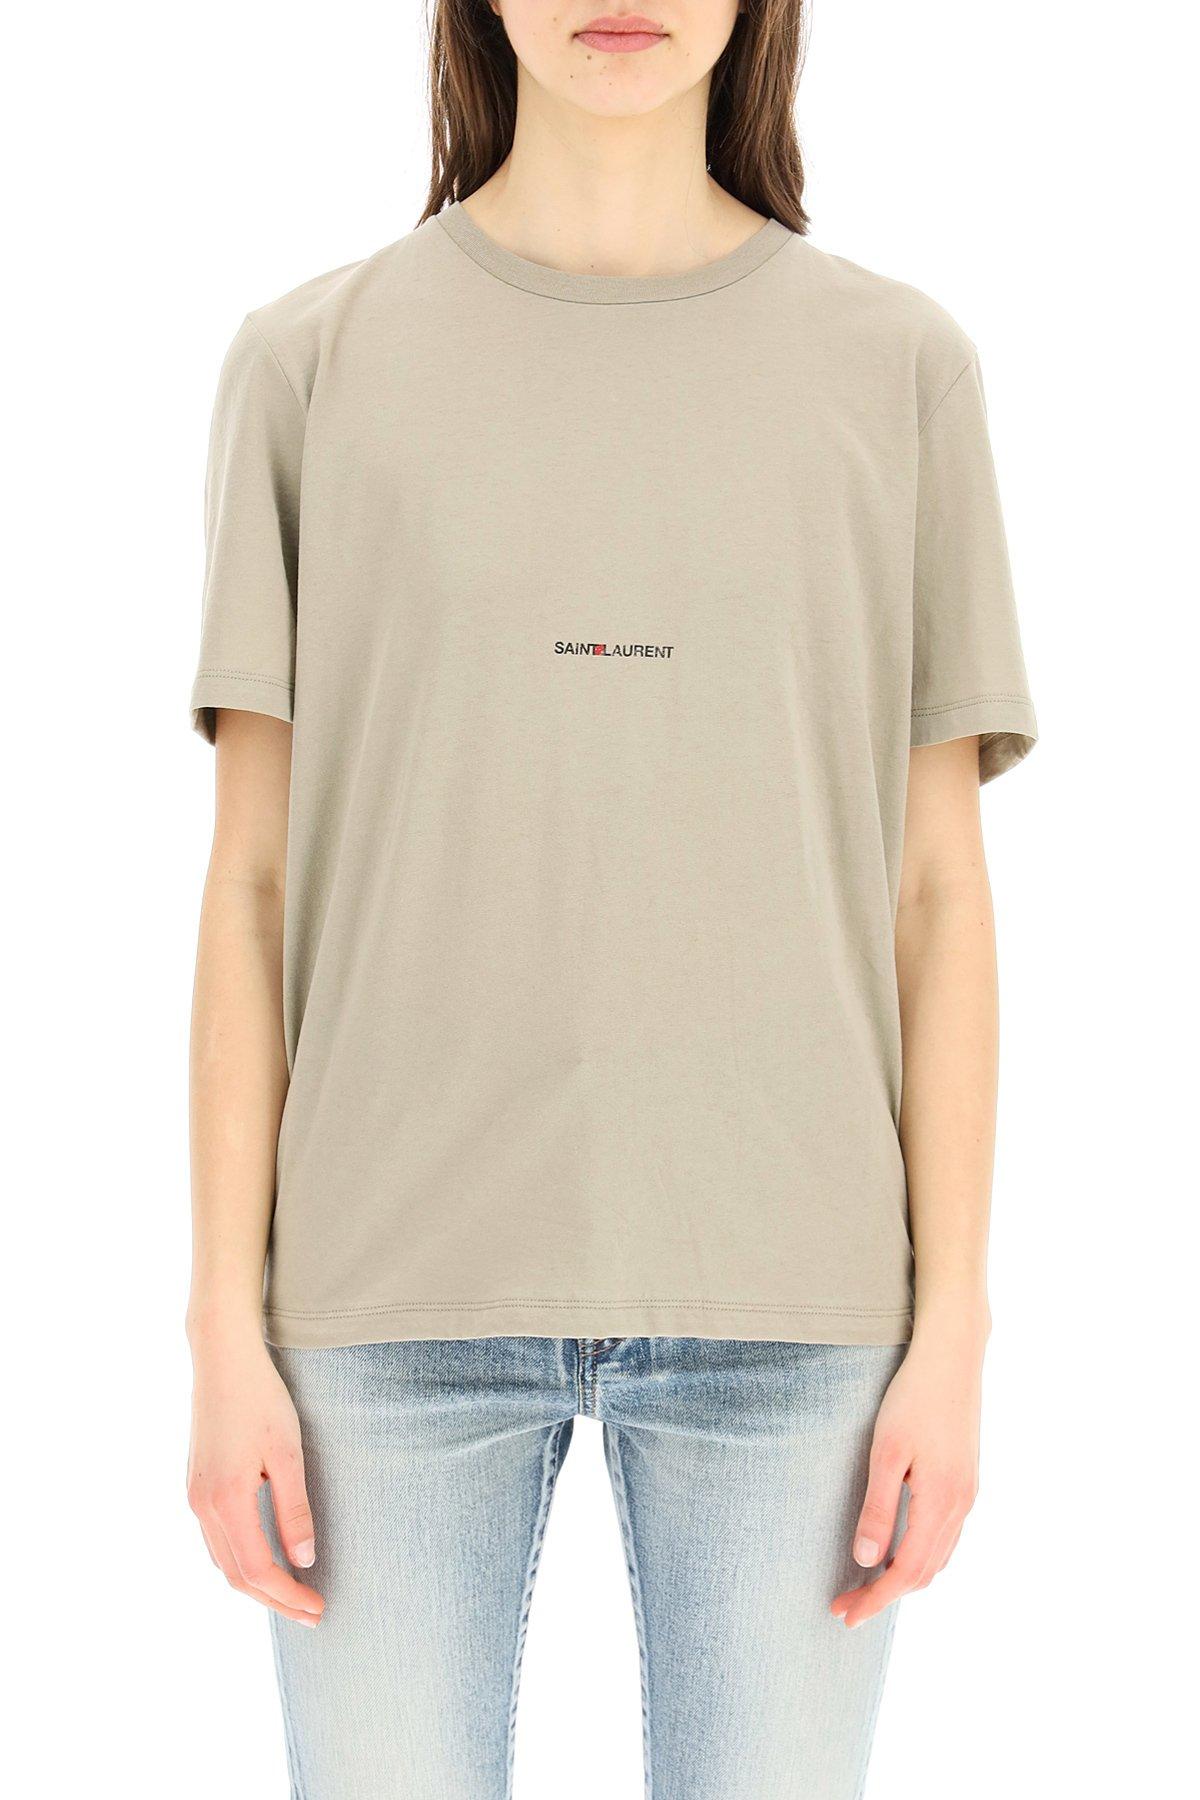 Saint laurent t-shirt stampa logo